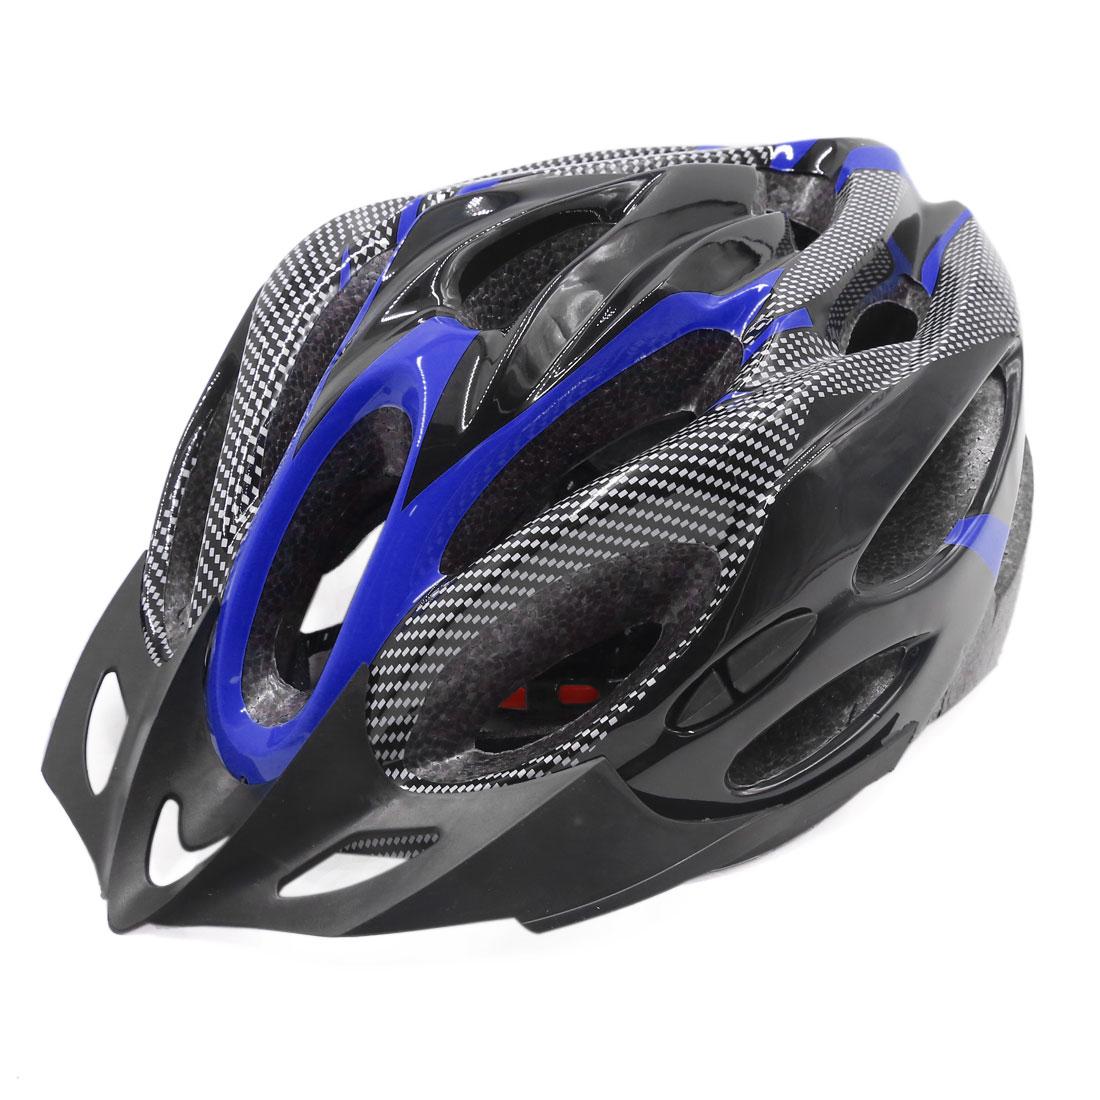 Carbon Fiber Pattern Adjustable Outdoor Bicycle Road Bike Helmet Blue Black